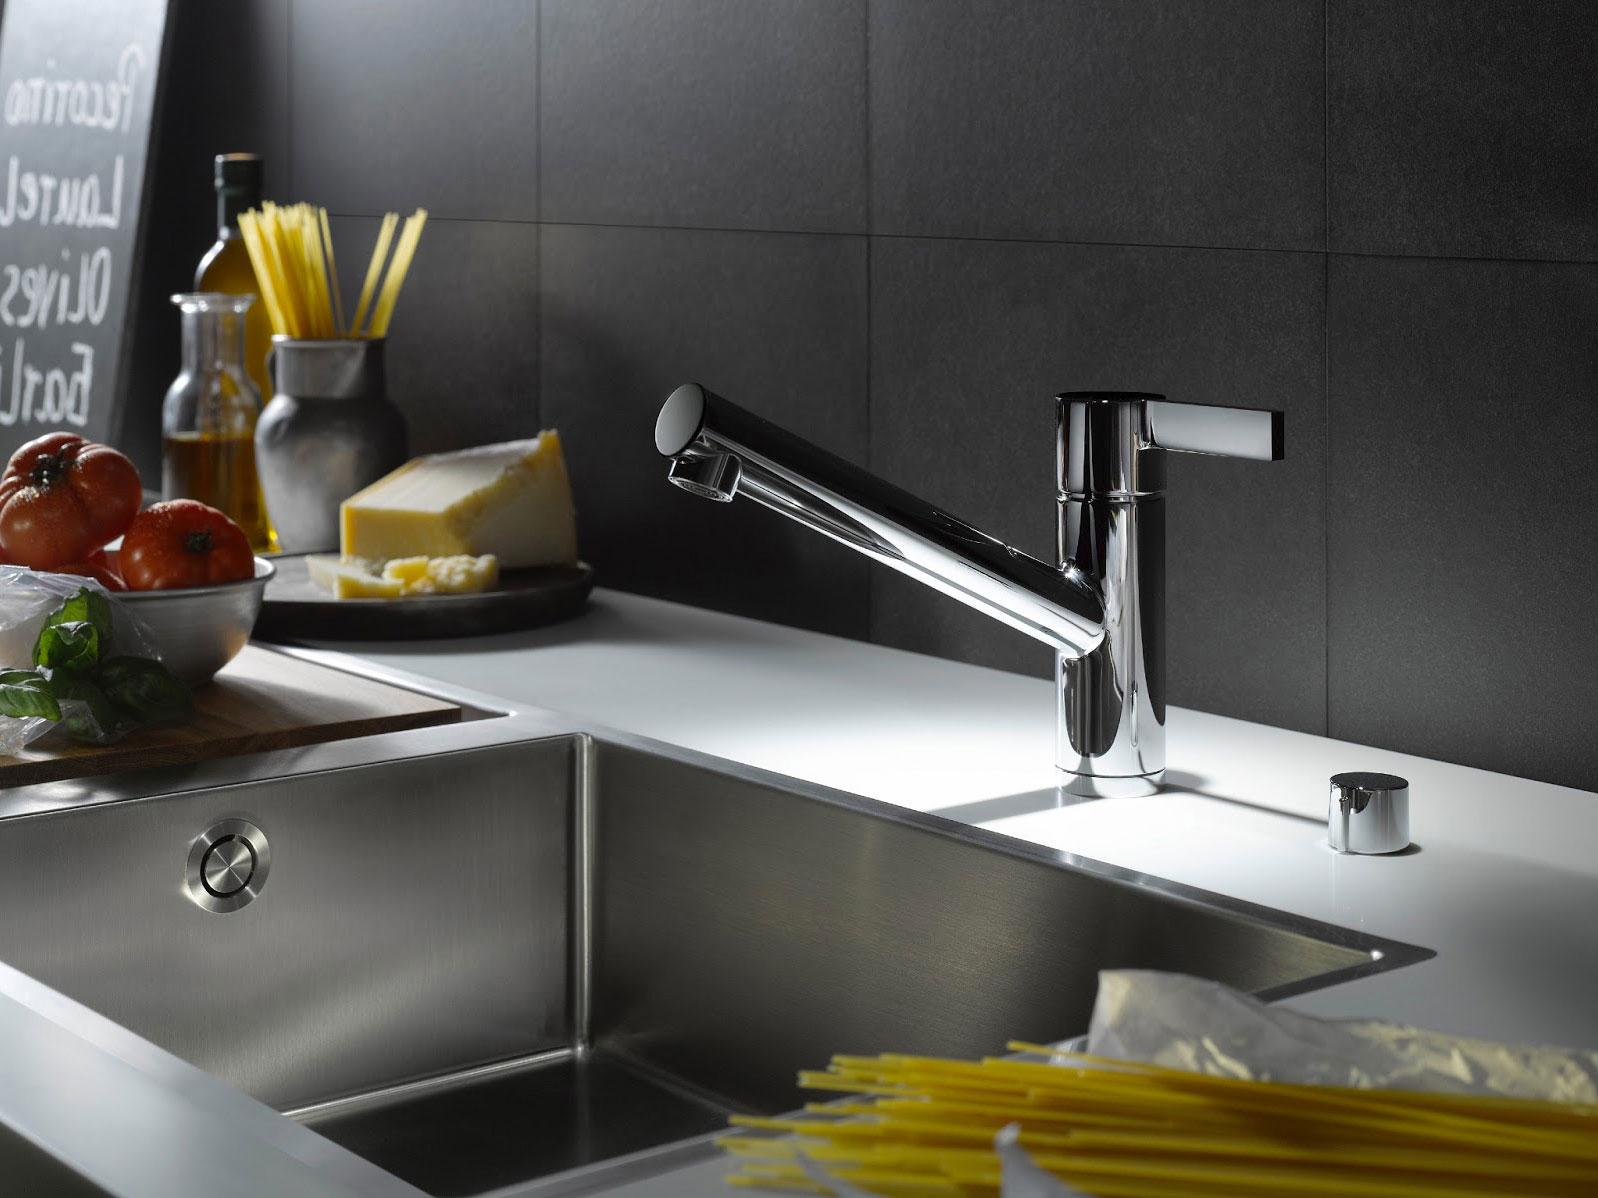 Dornbracht Kitchen Faucet | Dornbracht Bathroom Faucet | Dornbracht Kitchen Faucet